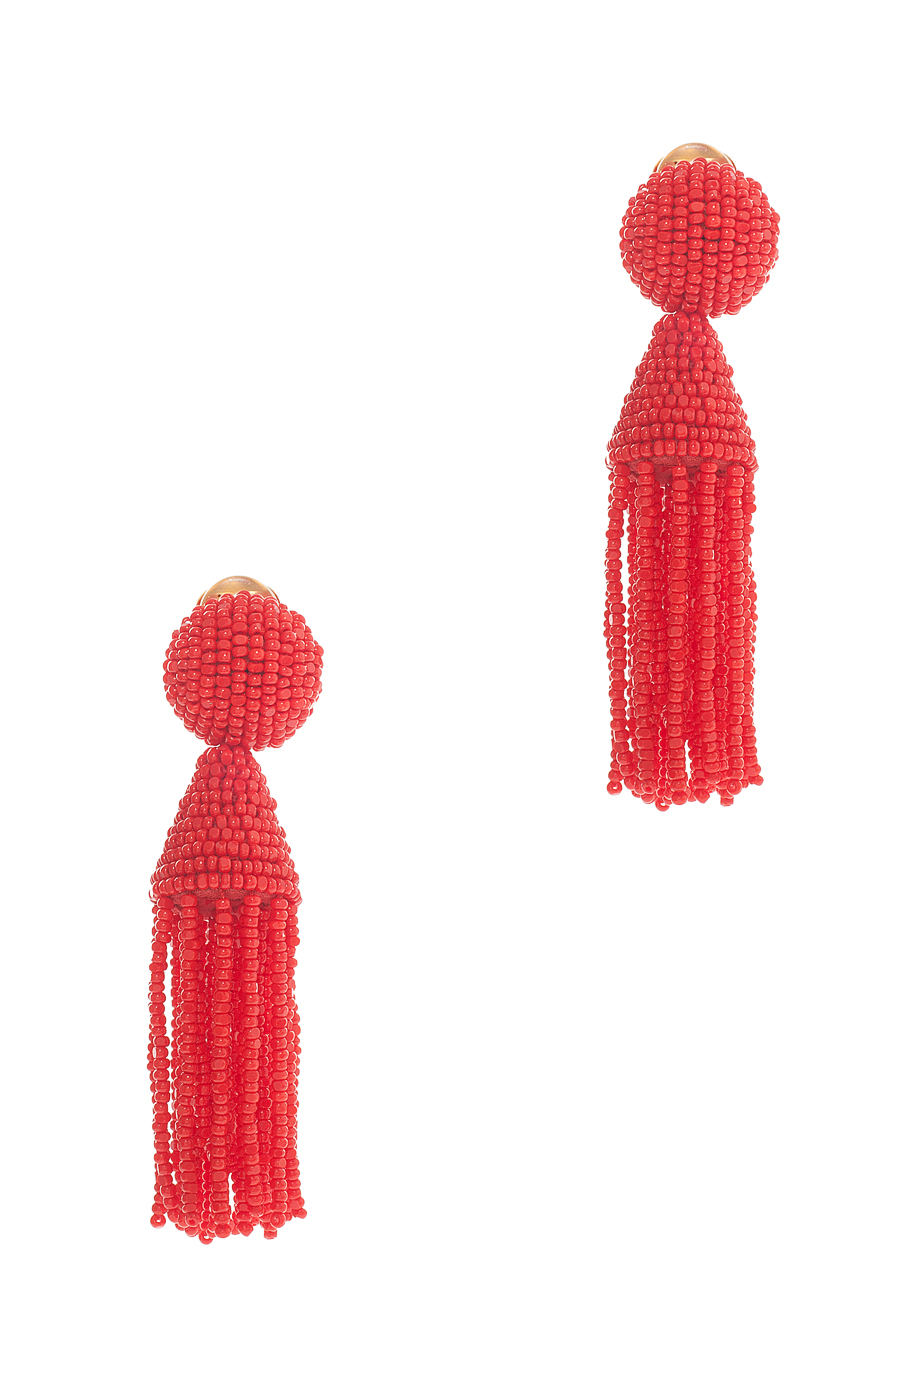 Thing besides Aint Baroque Dont Fix furthermore Spring Summer Jewellery Trends as well Oscar De La Renta Short Beaded Tassel Earrings Red together with Thing. on oscar de la renta beaded tassel earrings